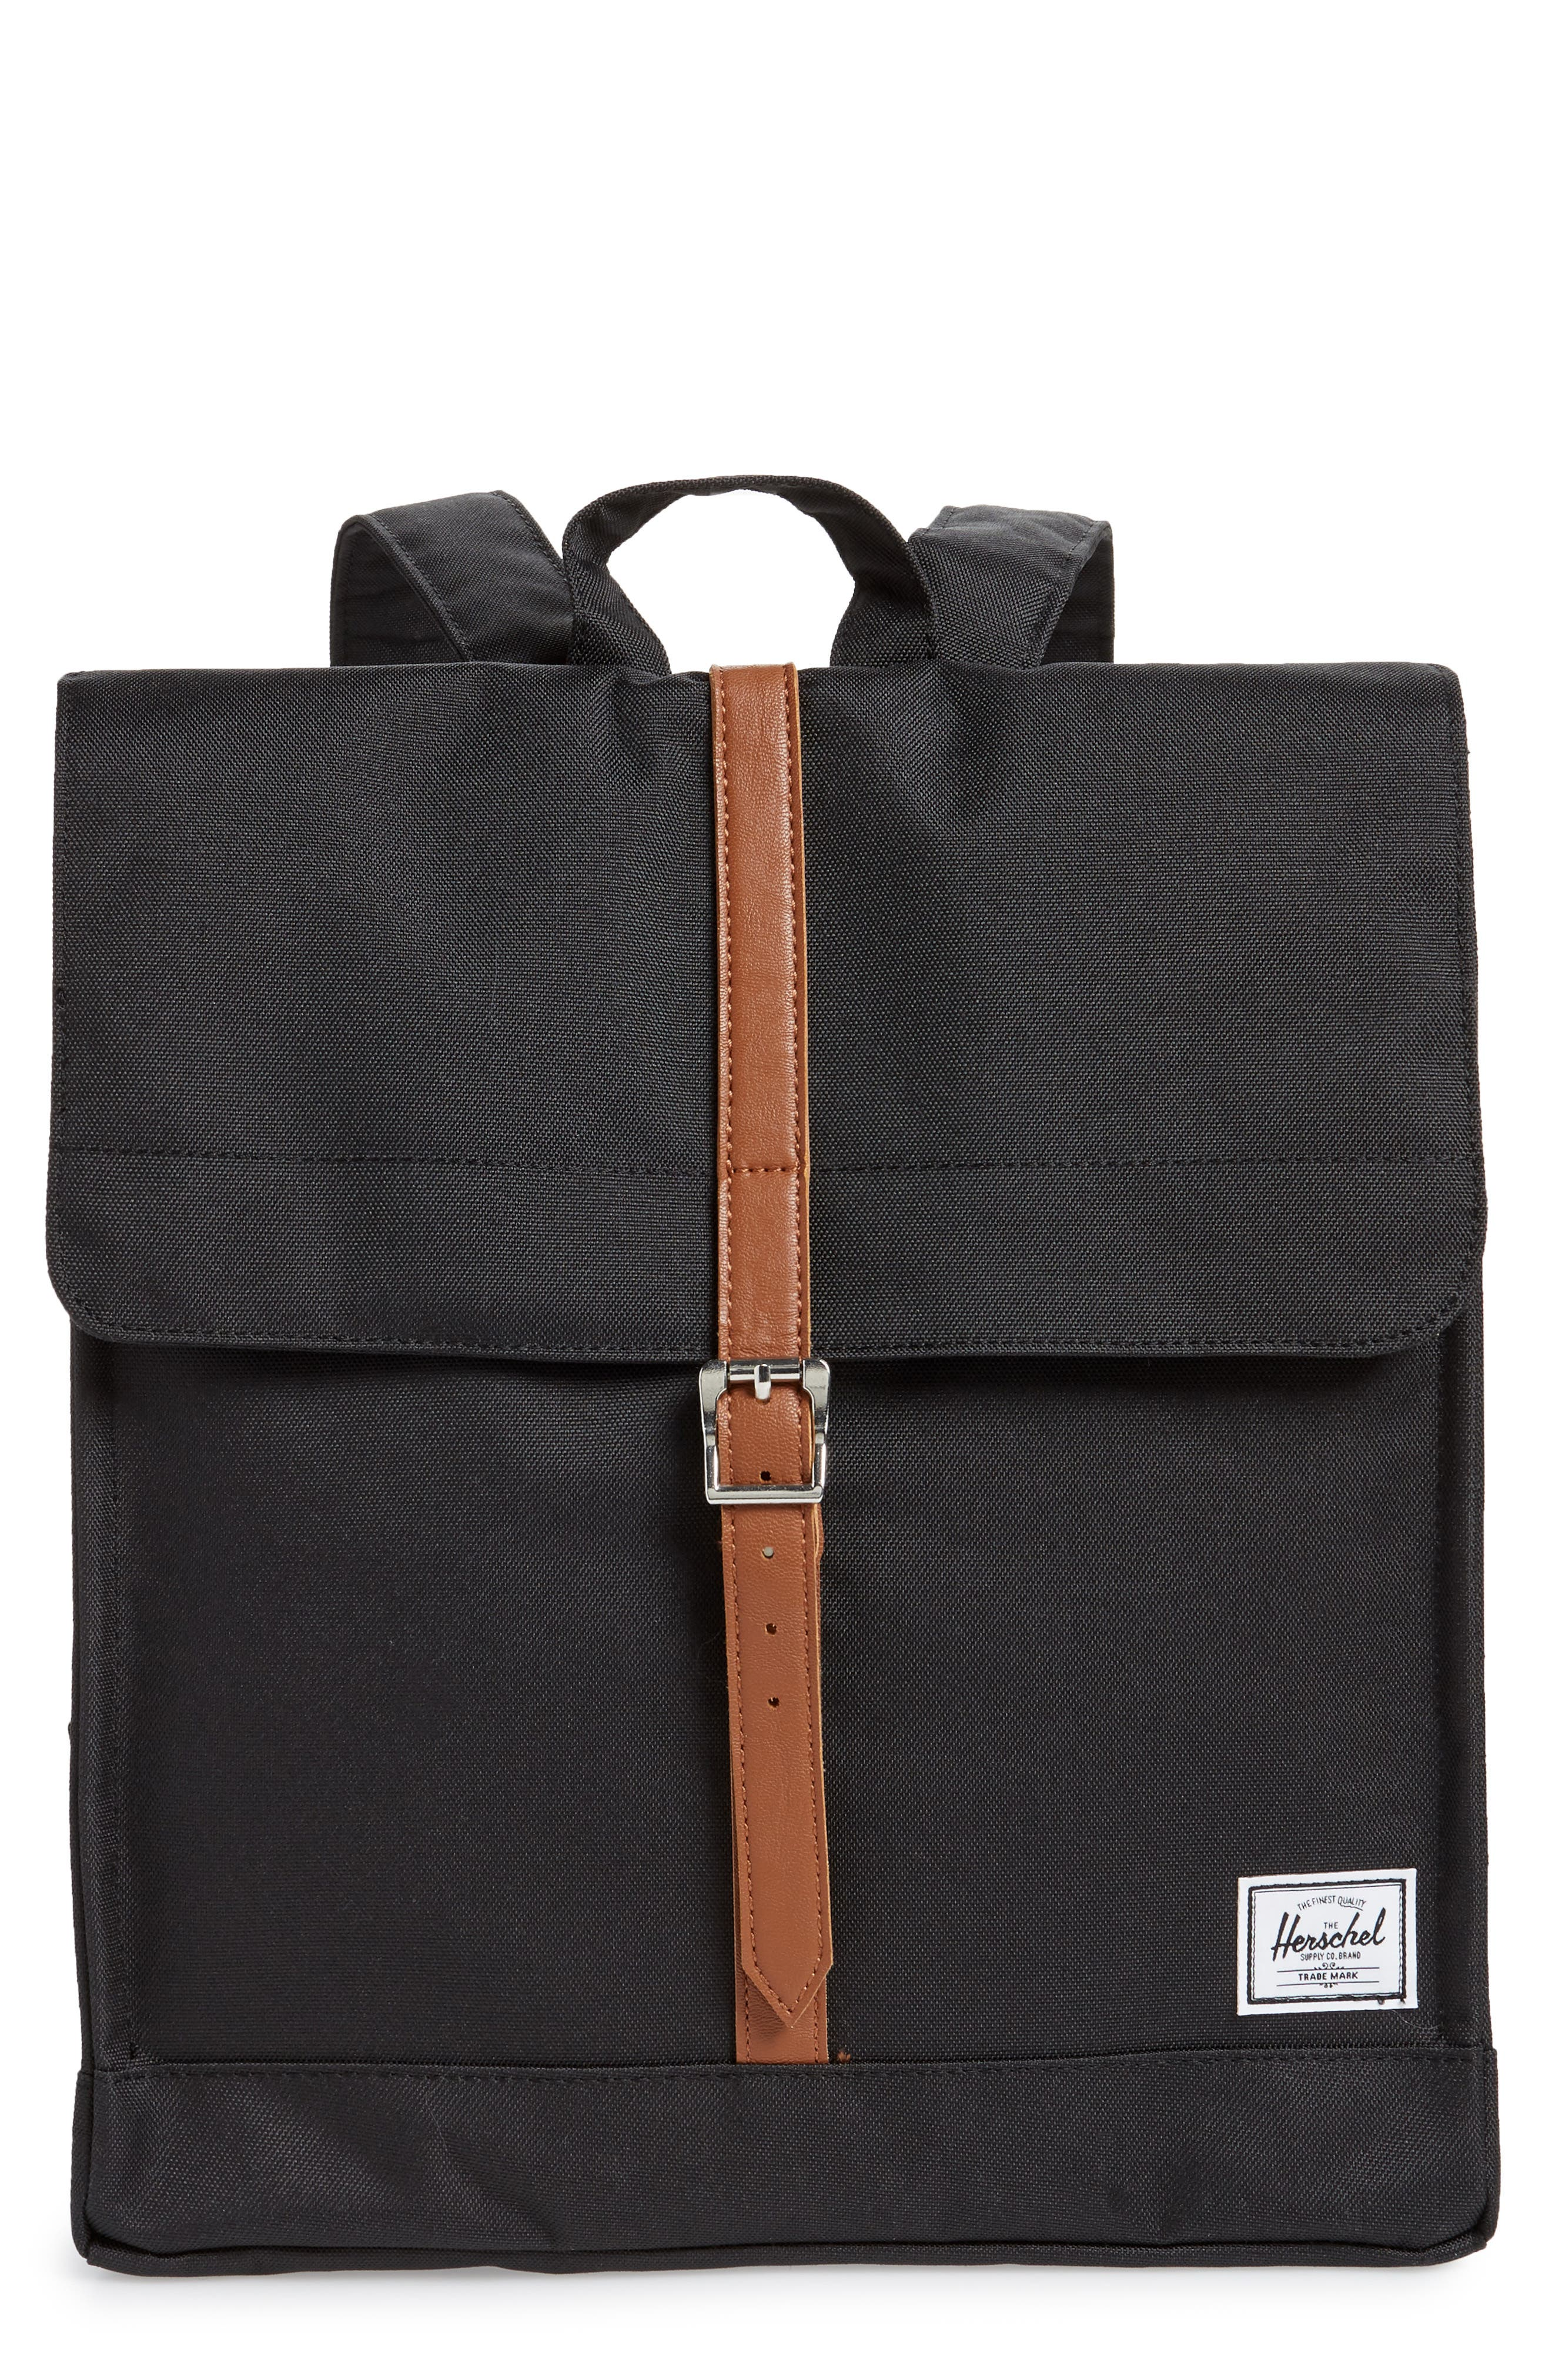 Herschel Supply Co. City Mid Volume Backpack - Black